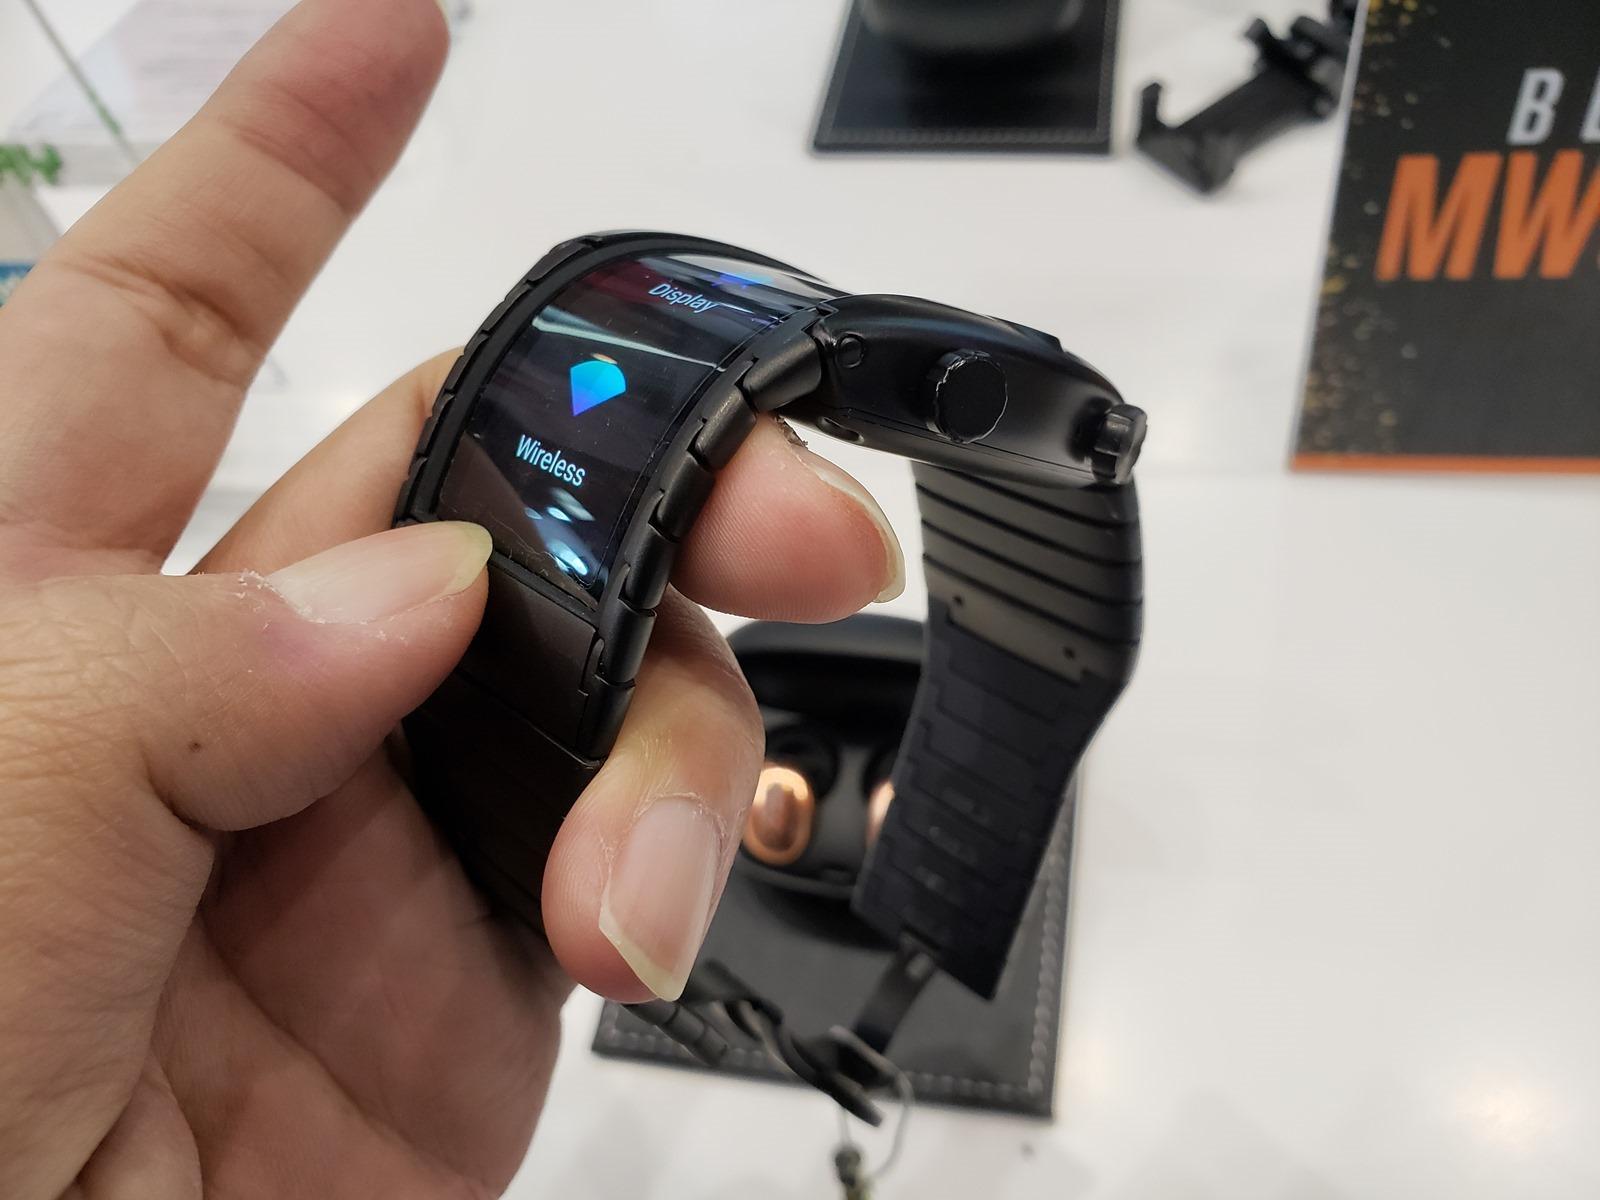 Nubia Alpha 展出柔性可彎曲螢幕應用的穿戴式手錶手機 (含動手玩影片) @3C 達人廖阿輝